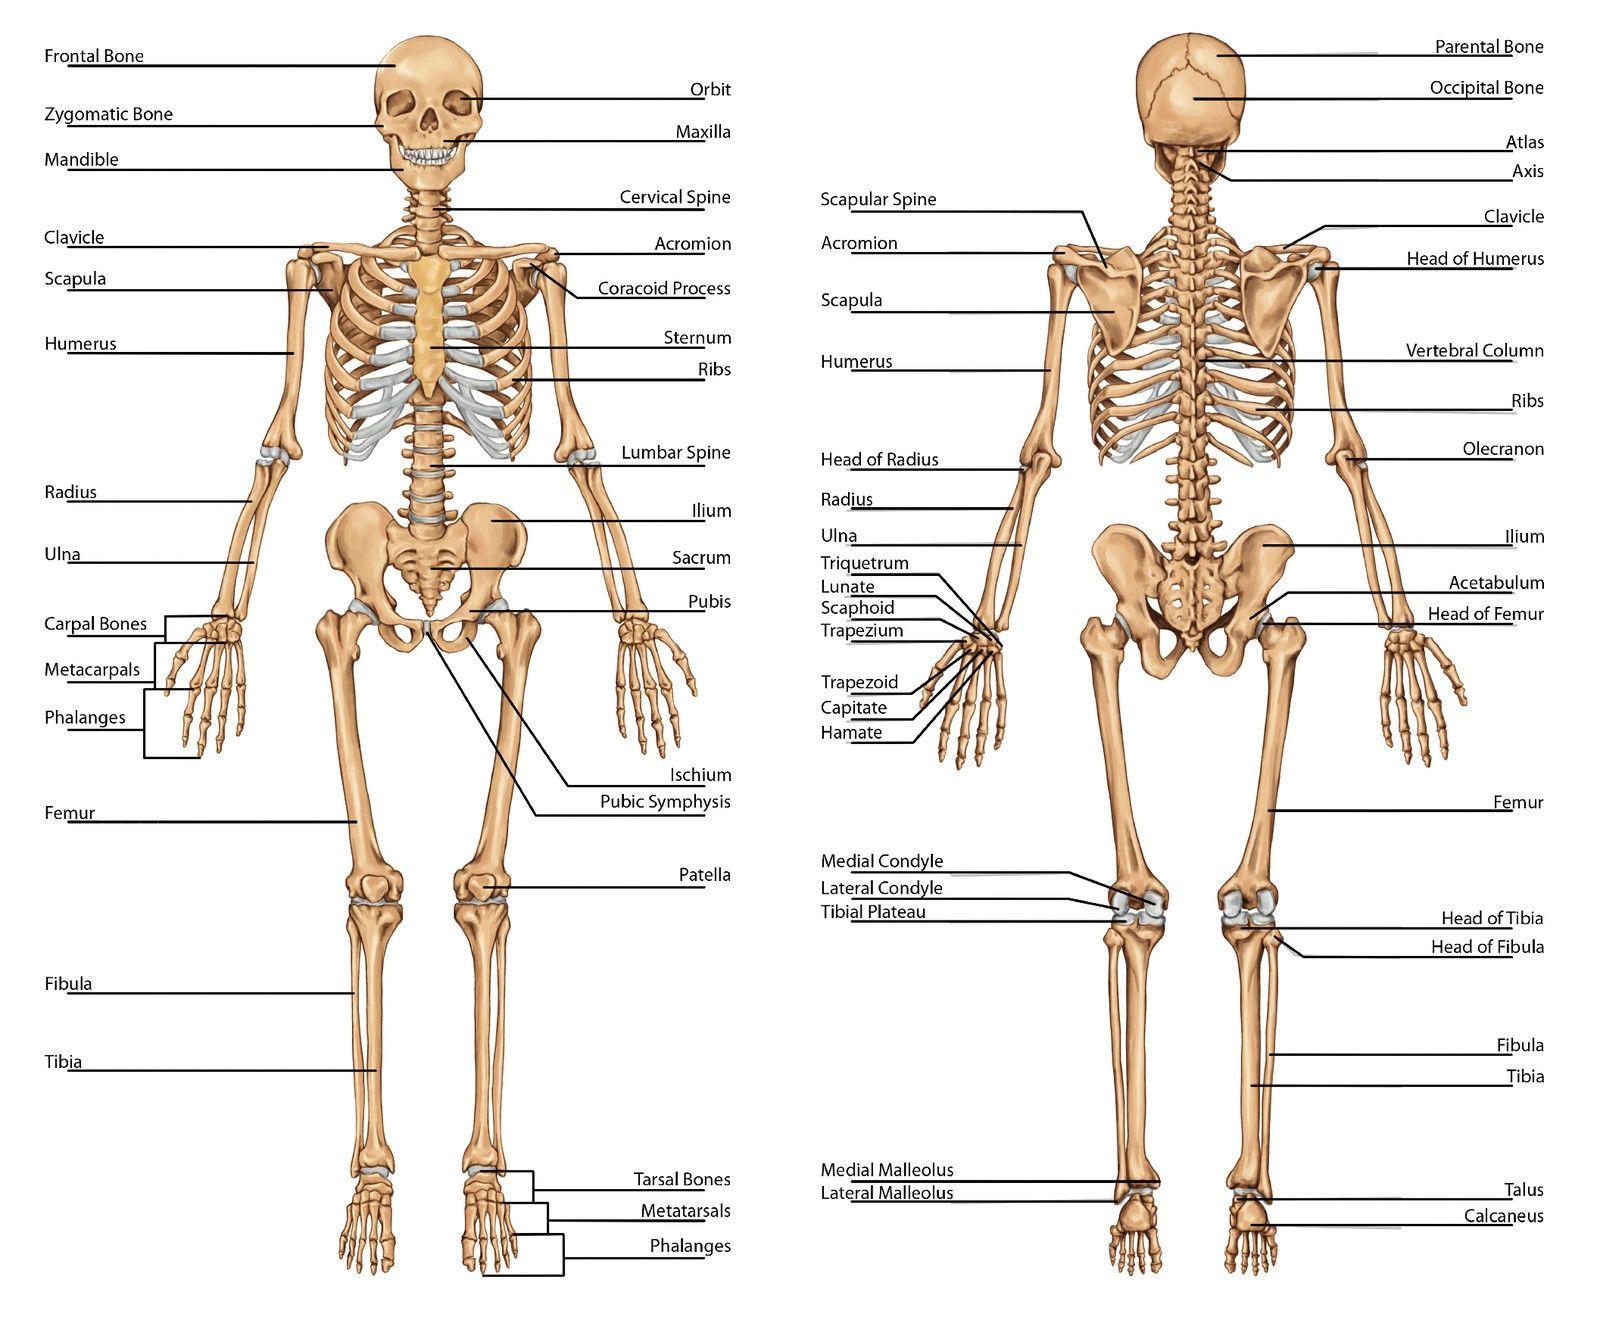 Human Anatomy Bones Diagram Anatomy Of Bones In Human Body